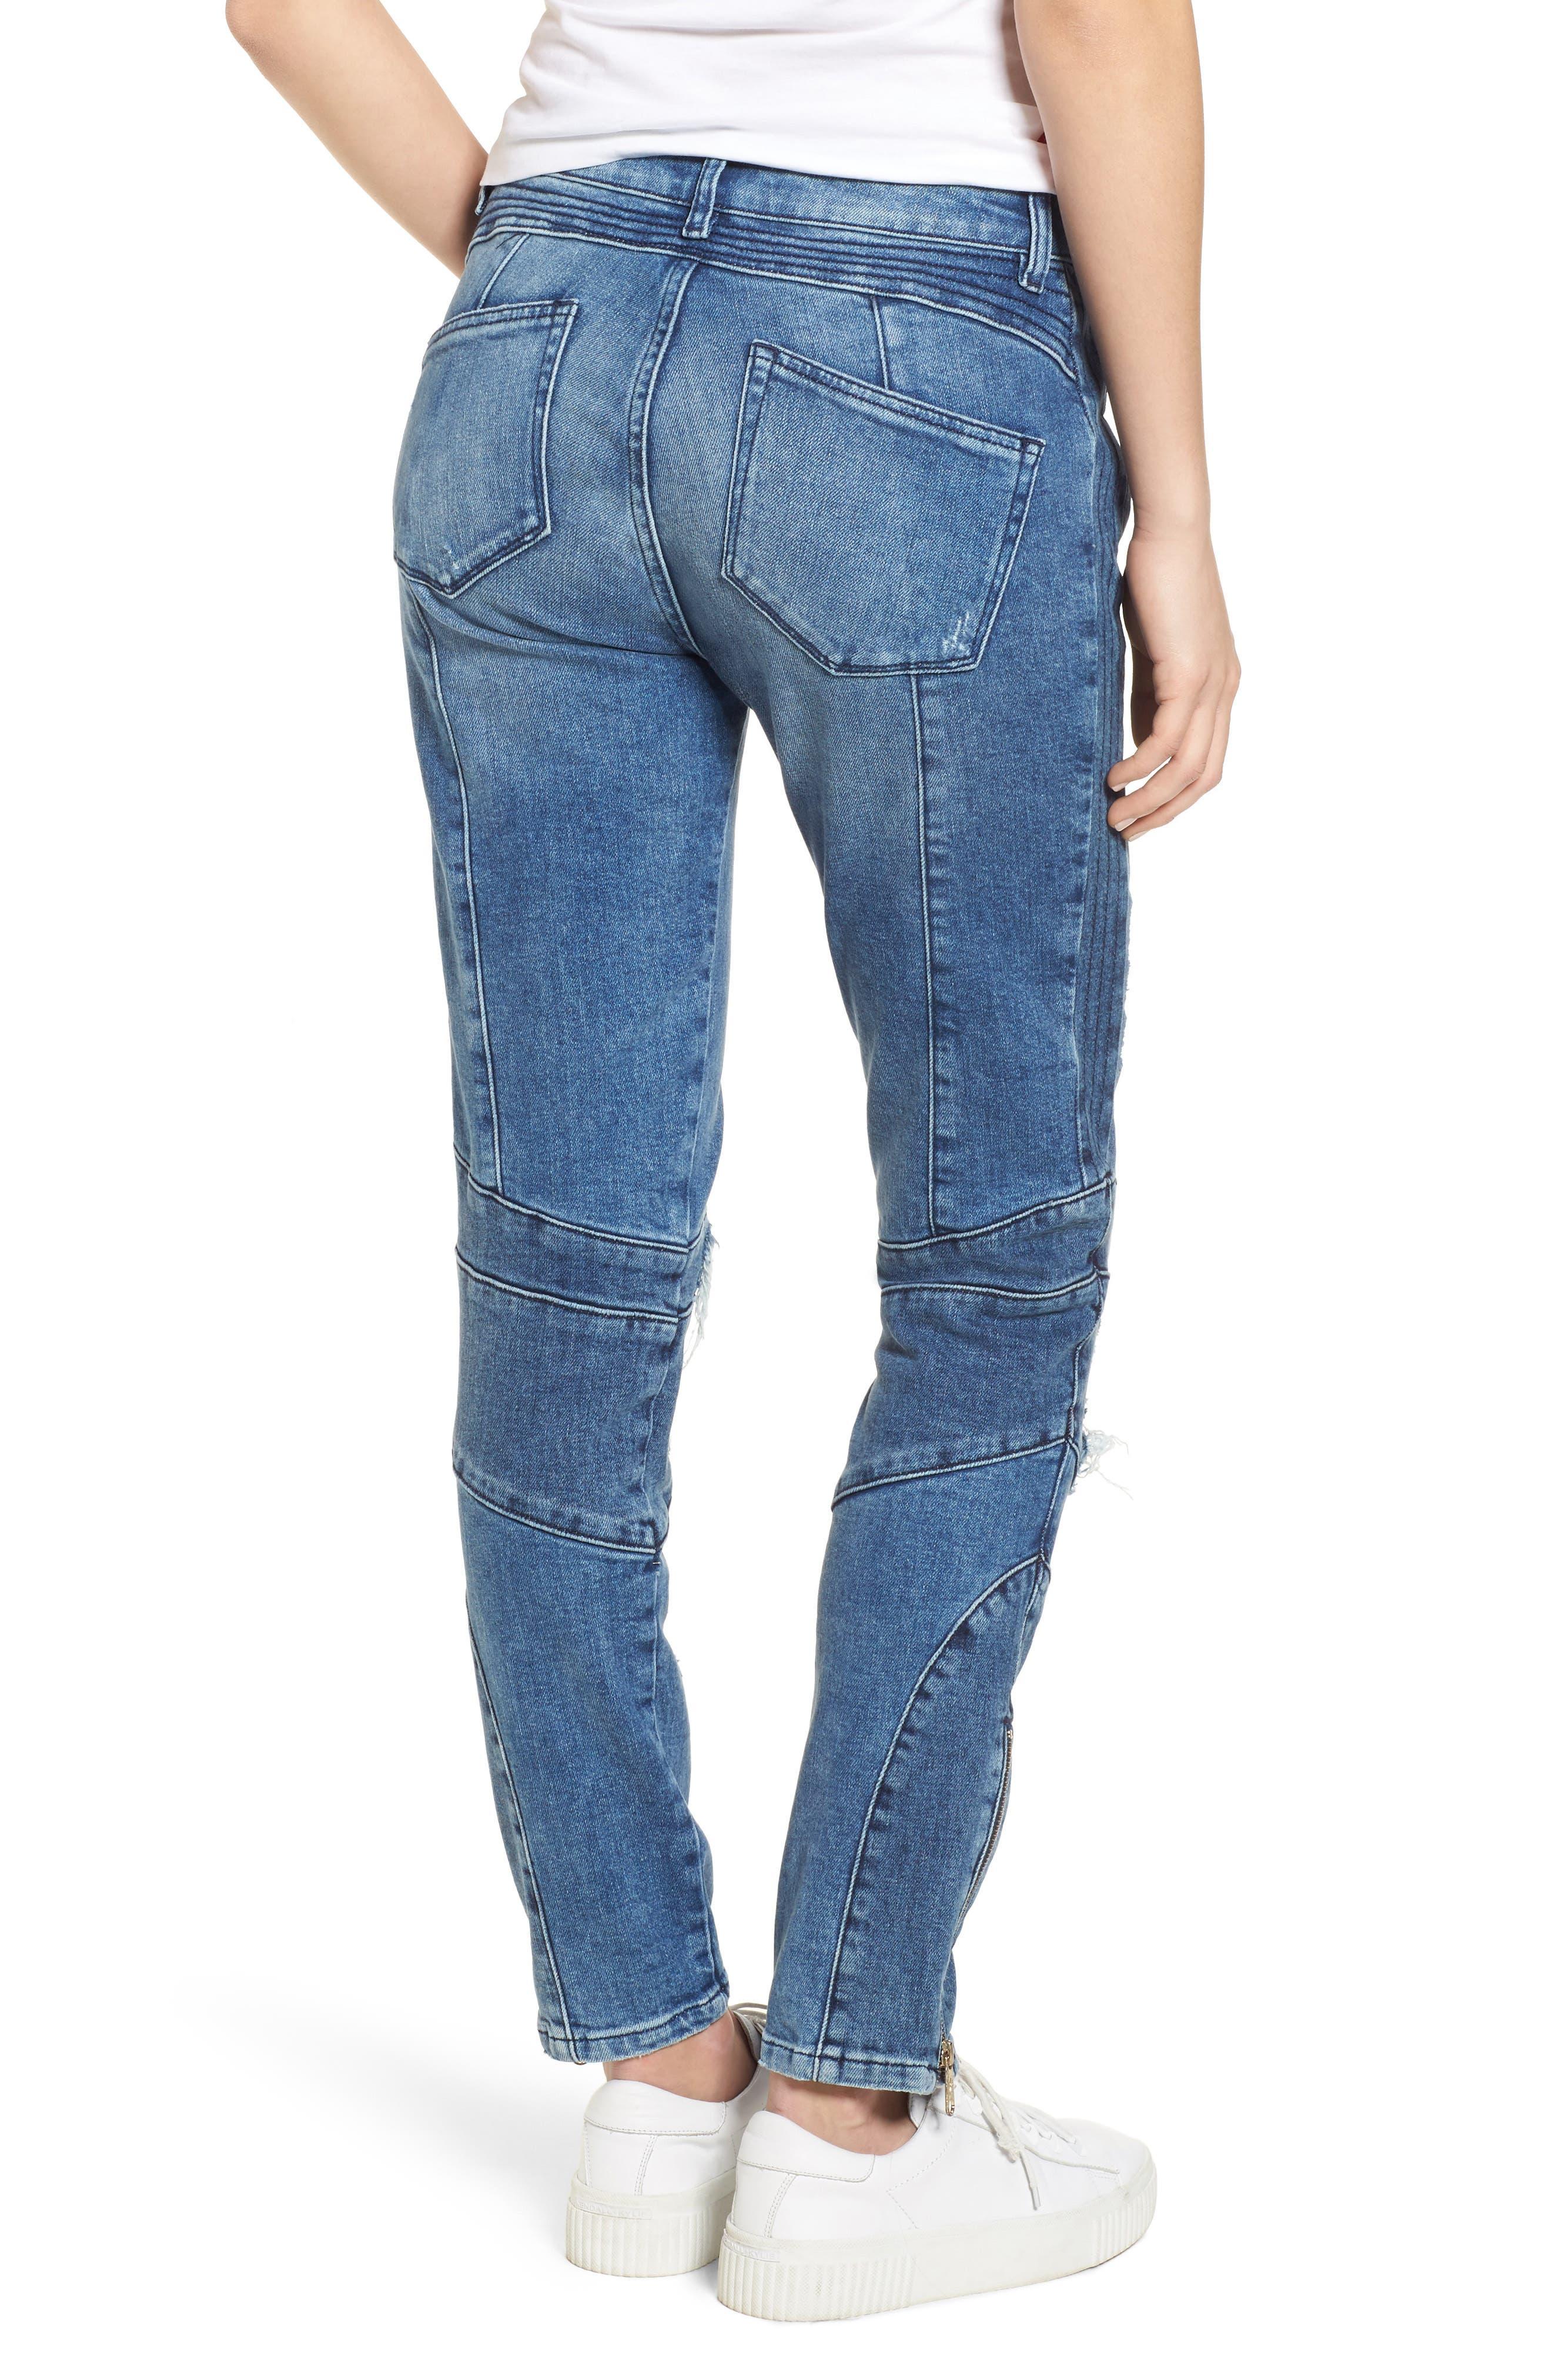 x Gigi Hadid Speed Distressed Ankle Zip Jeans,                             Alternate thumbnail 3, color,                             Mid Blue